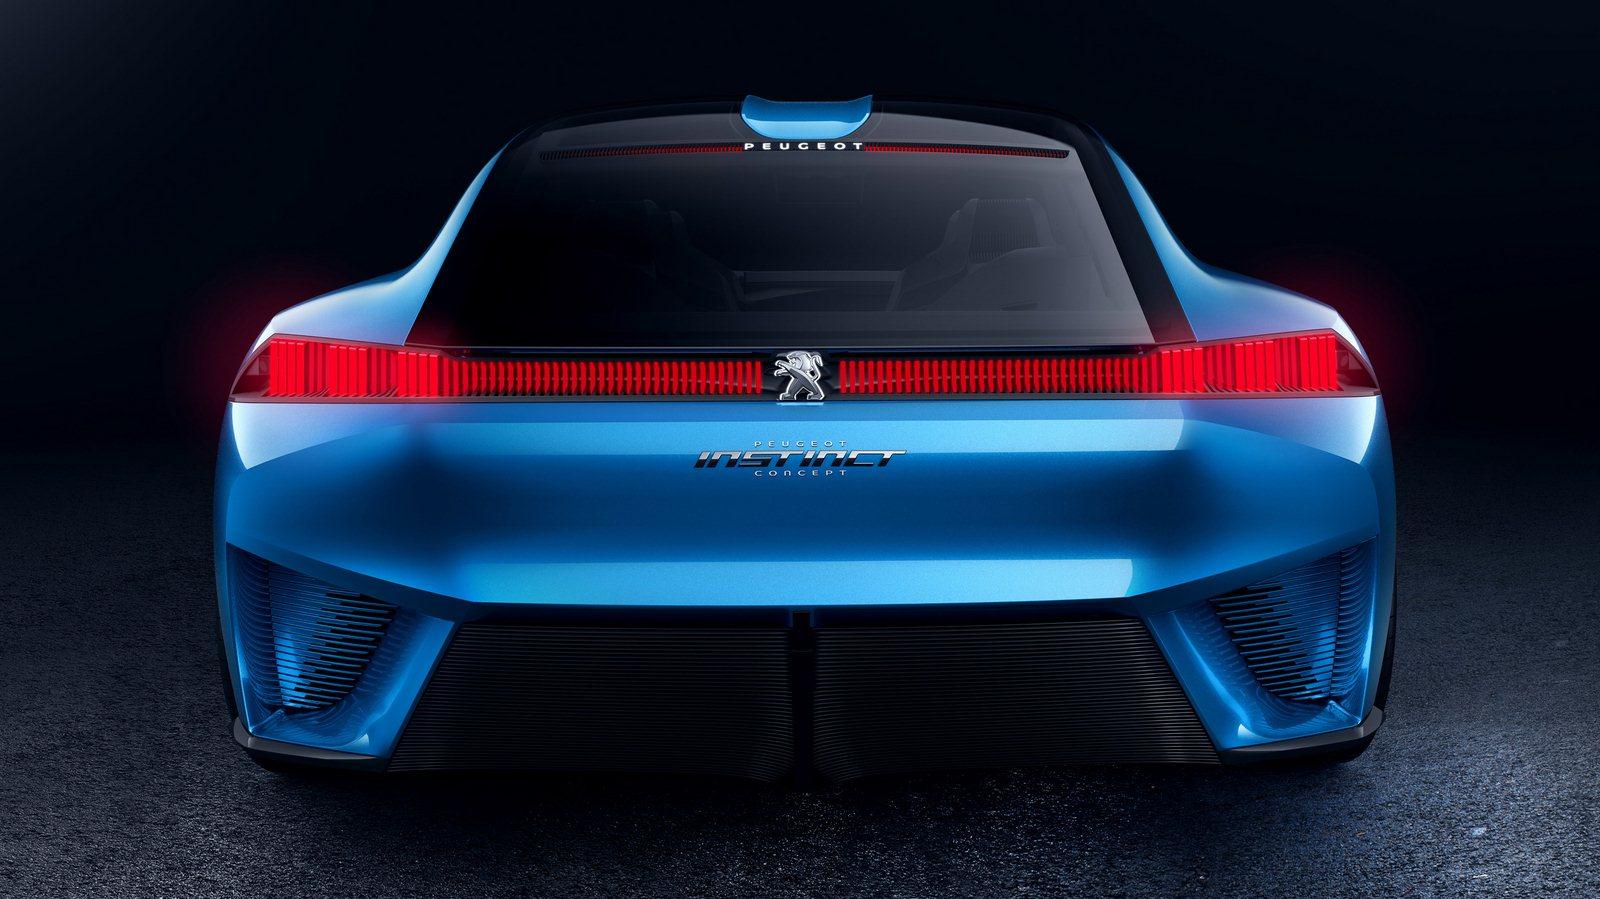 2017-Peugeot-Instinct-Concept-05